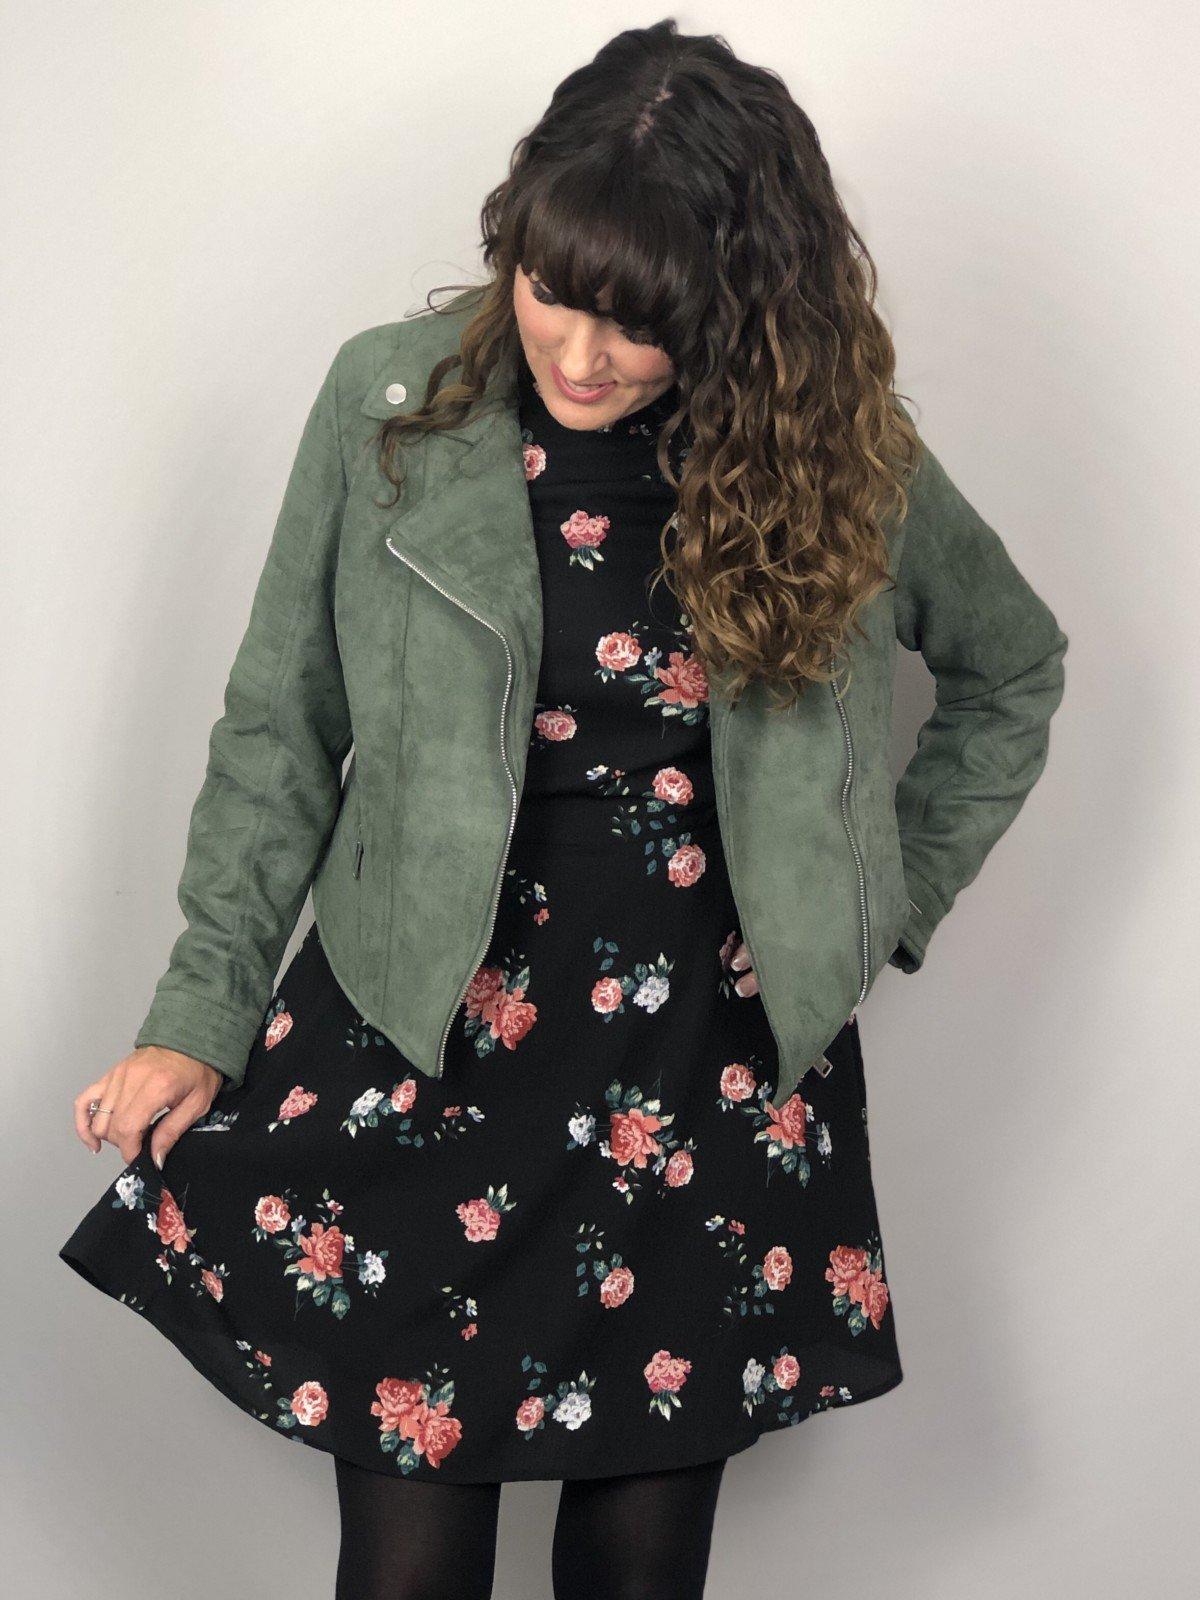 Floral tea dress and Suede khaki biker jacket